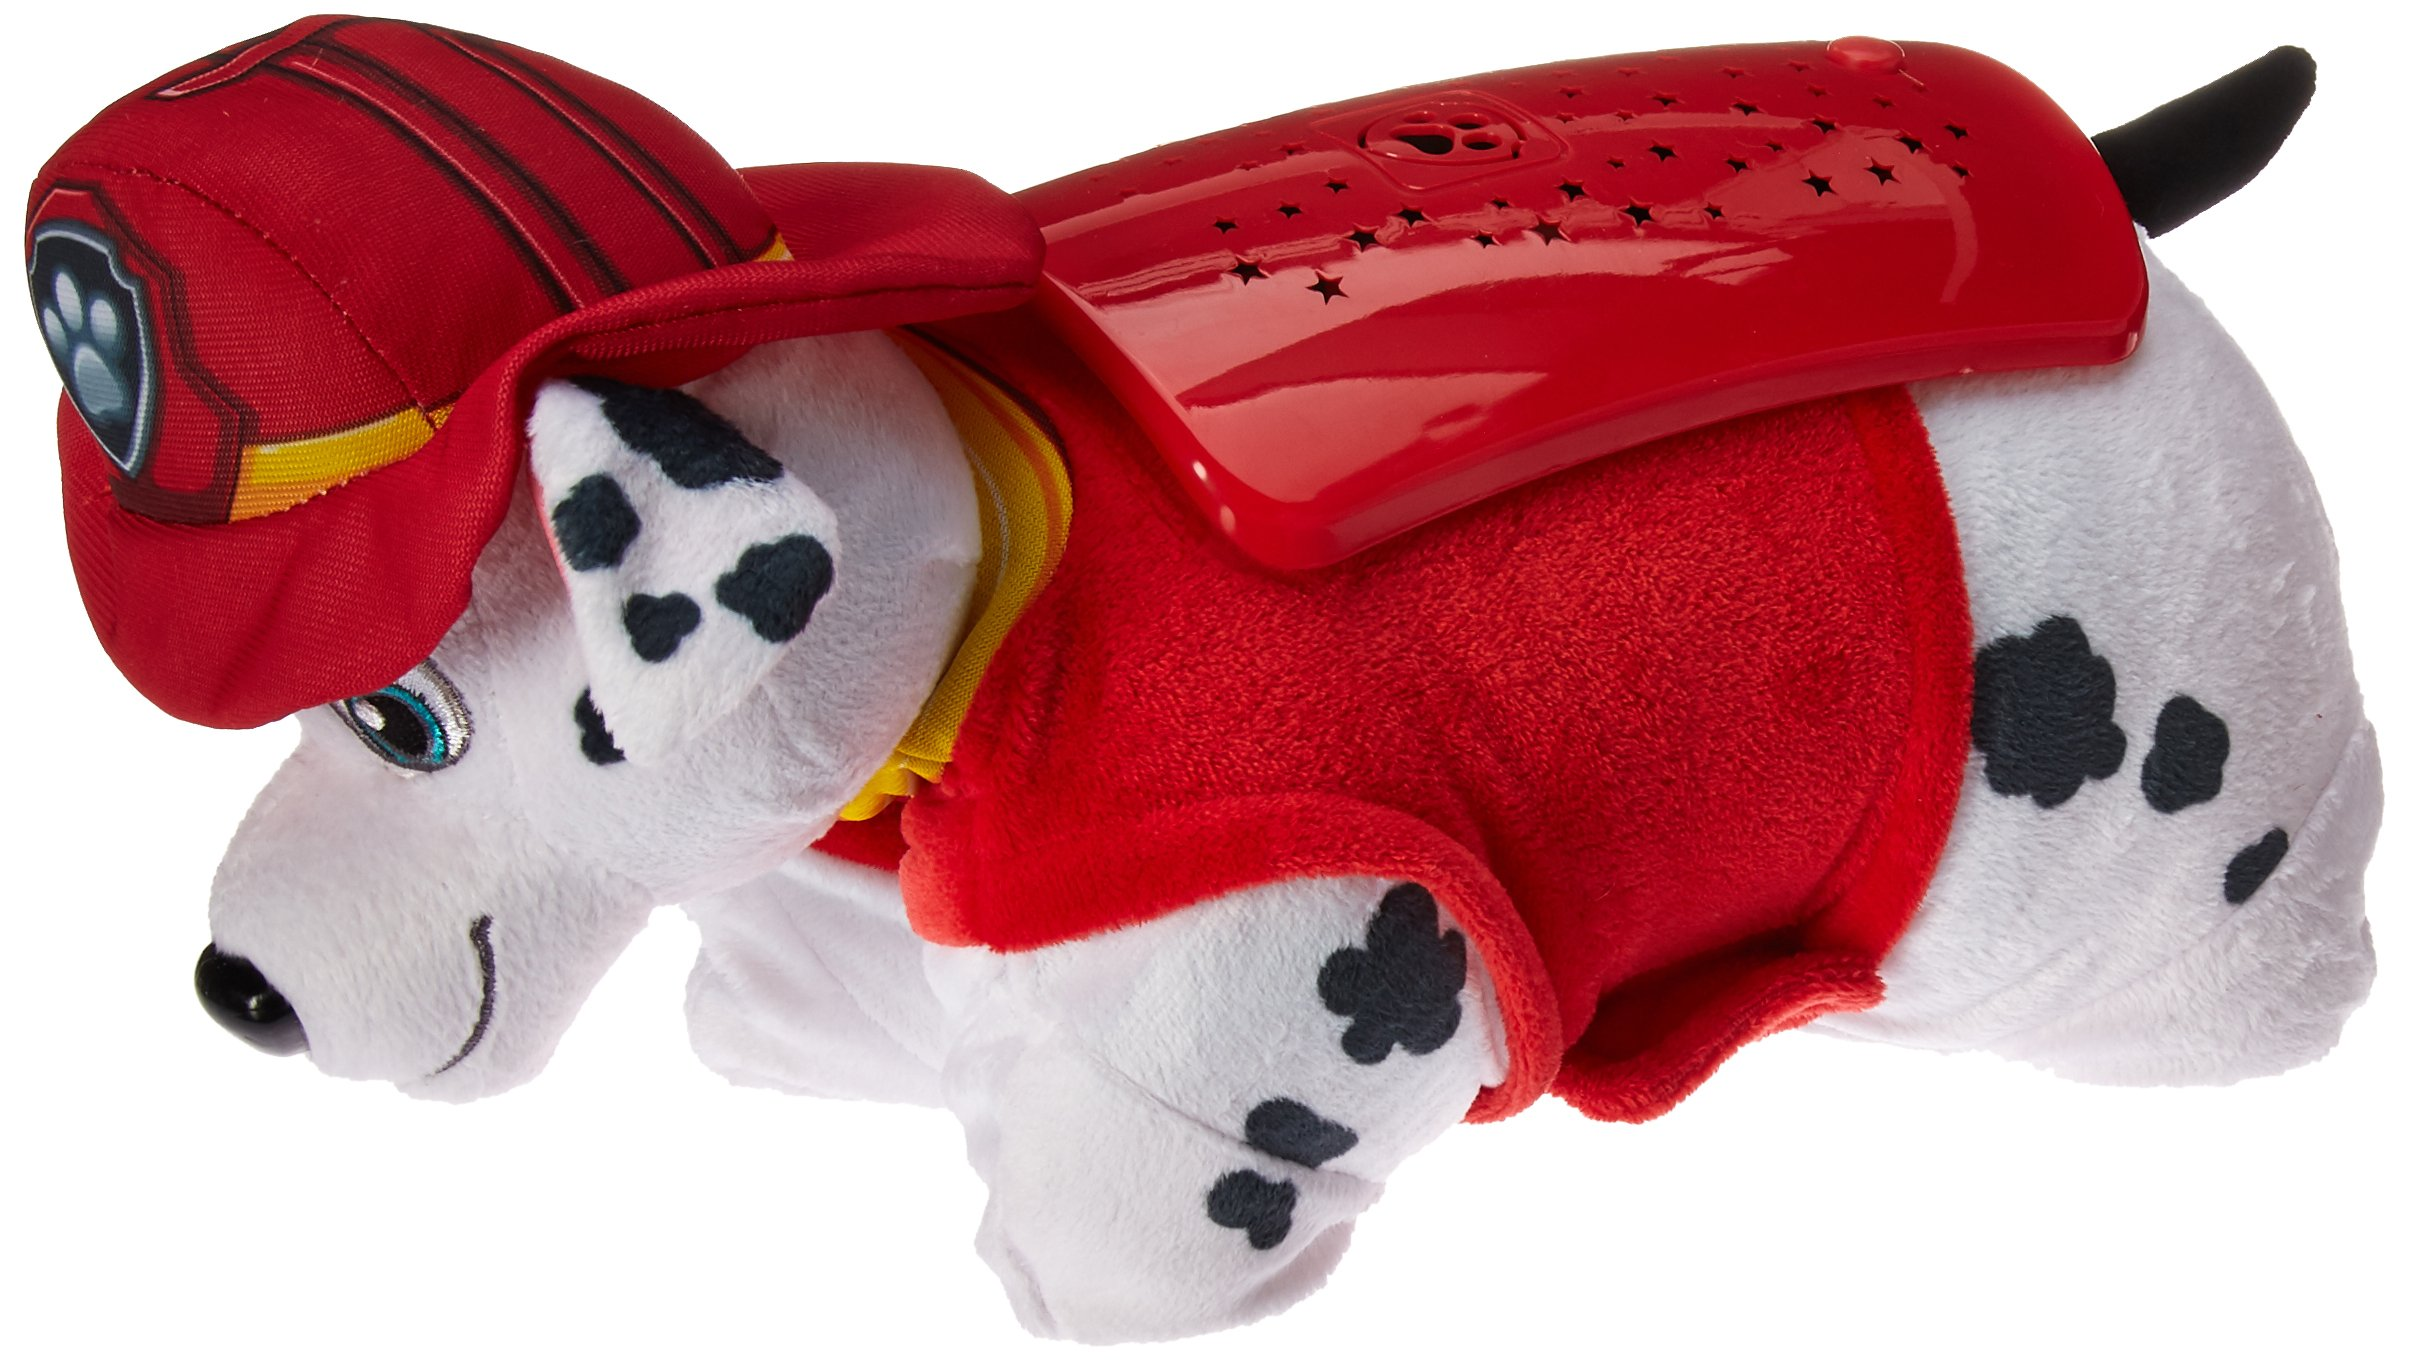 Pillow Pets Nickelodeon Paw Patrol Marshall Dream Lites Stuffed Animal Night Light